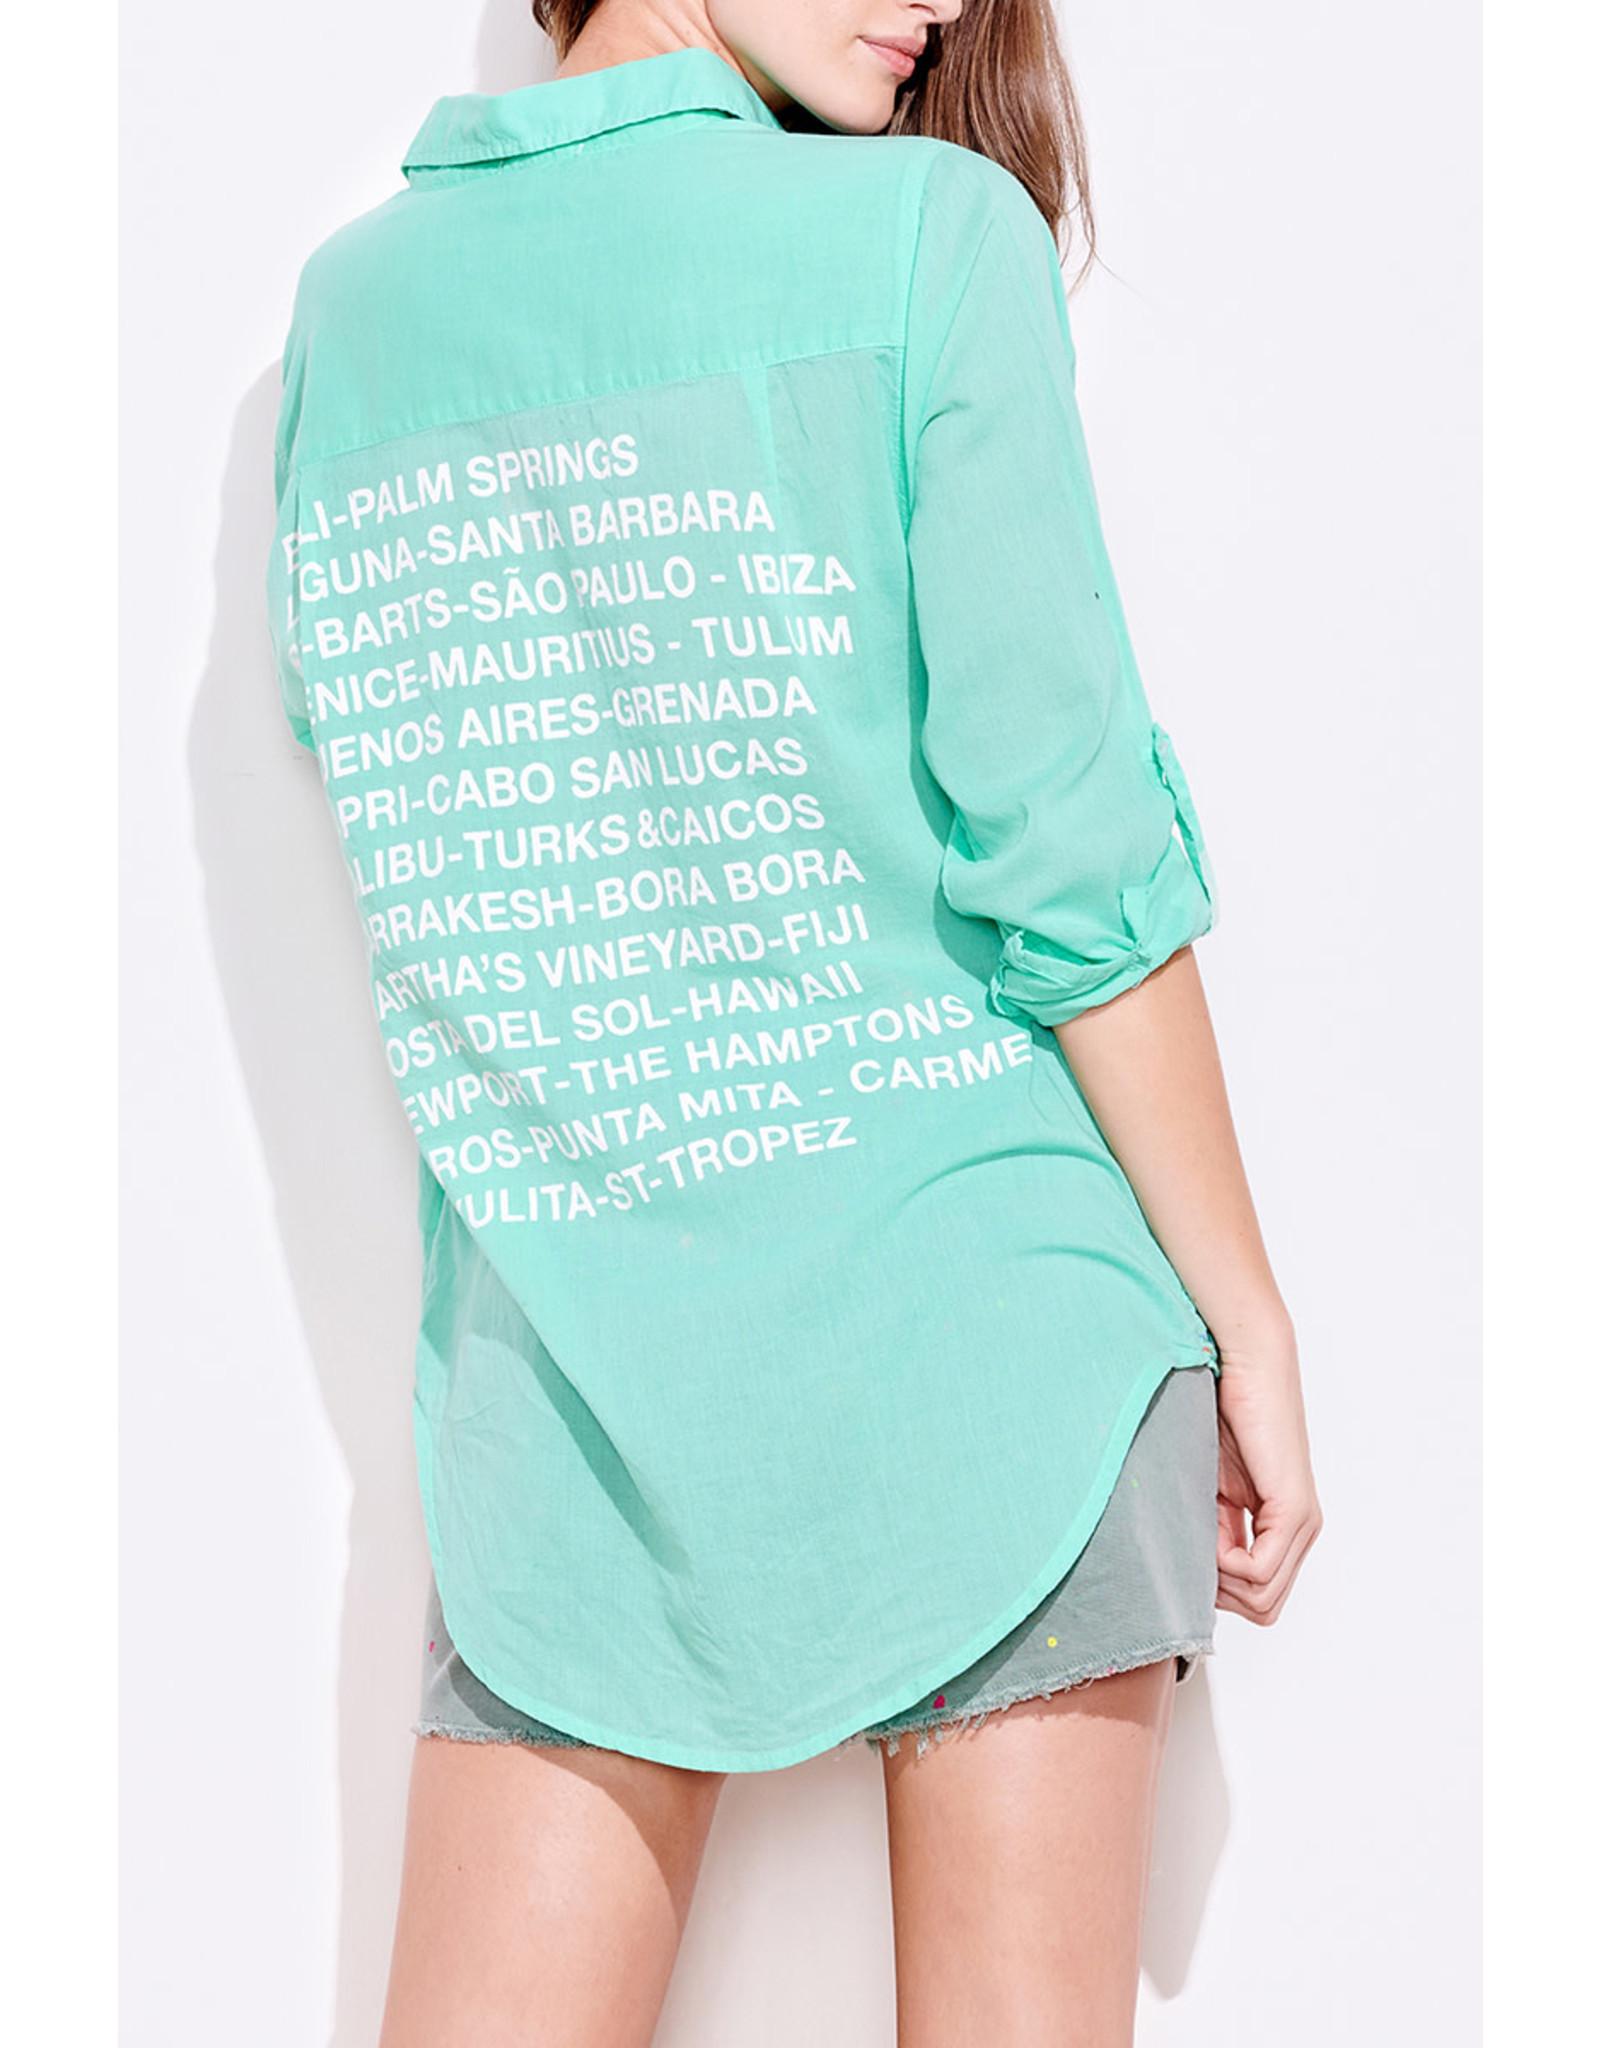 Sundry Sundry Destinations Oversz Shirt